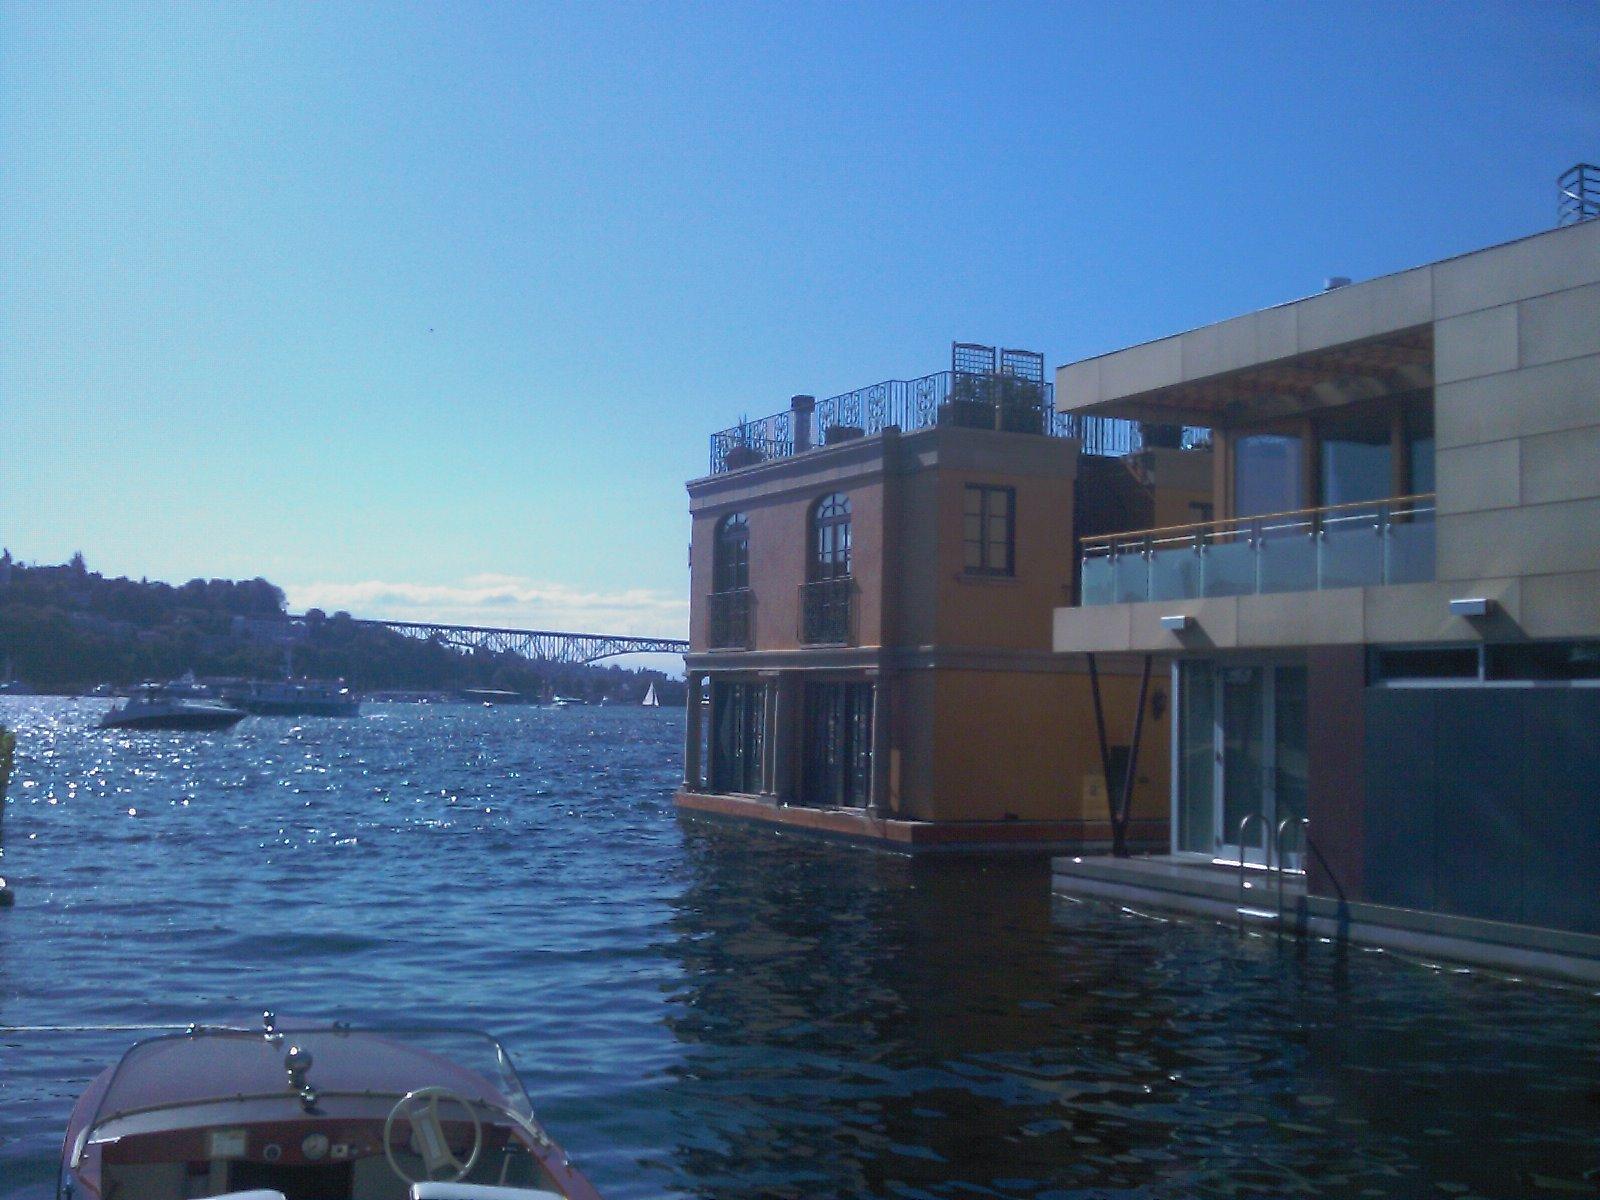 Lake union floating homes seattle floating homes - Floating house seattle ...